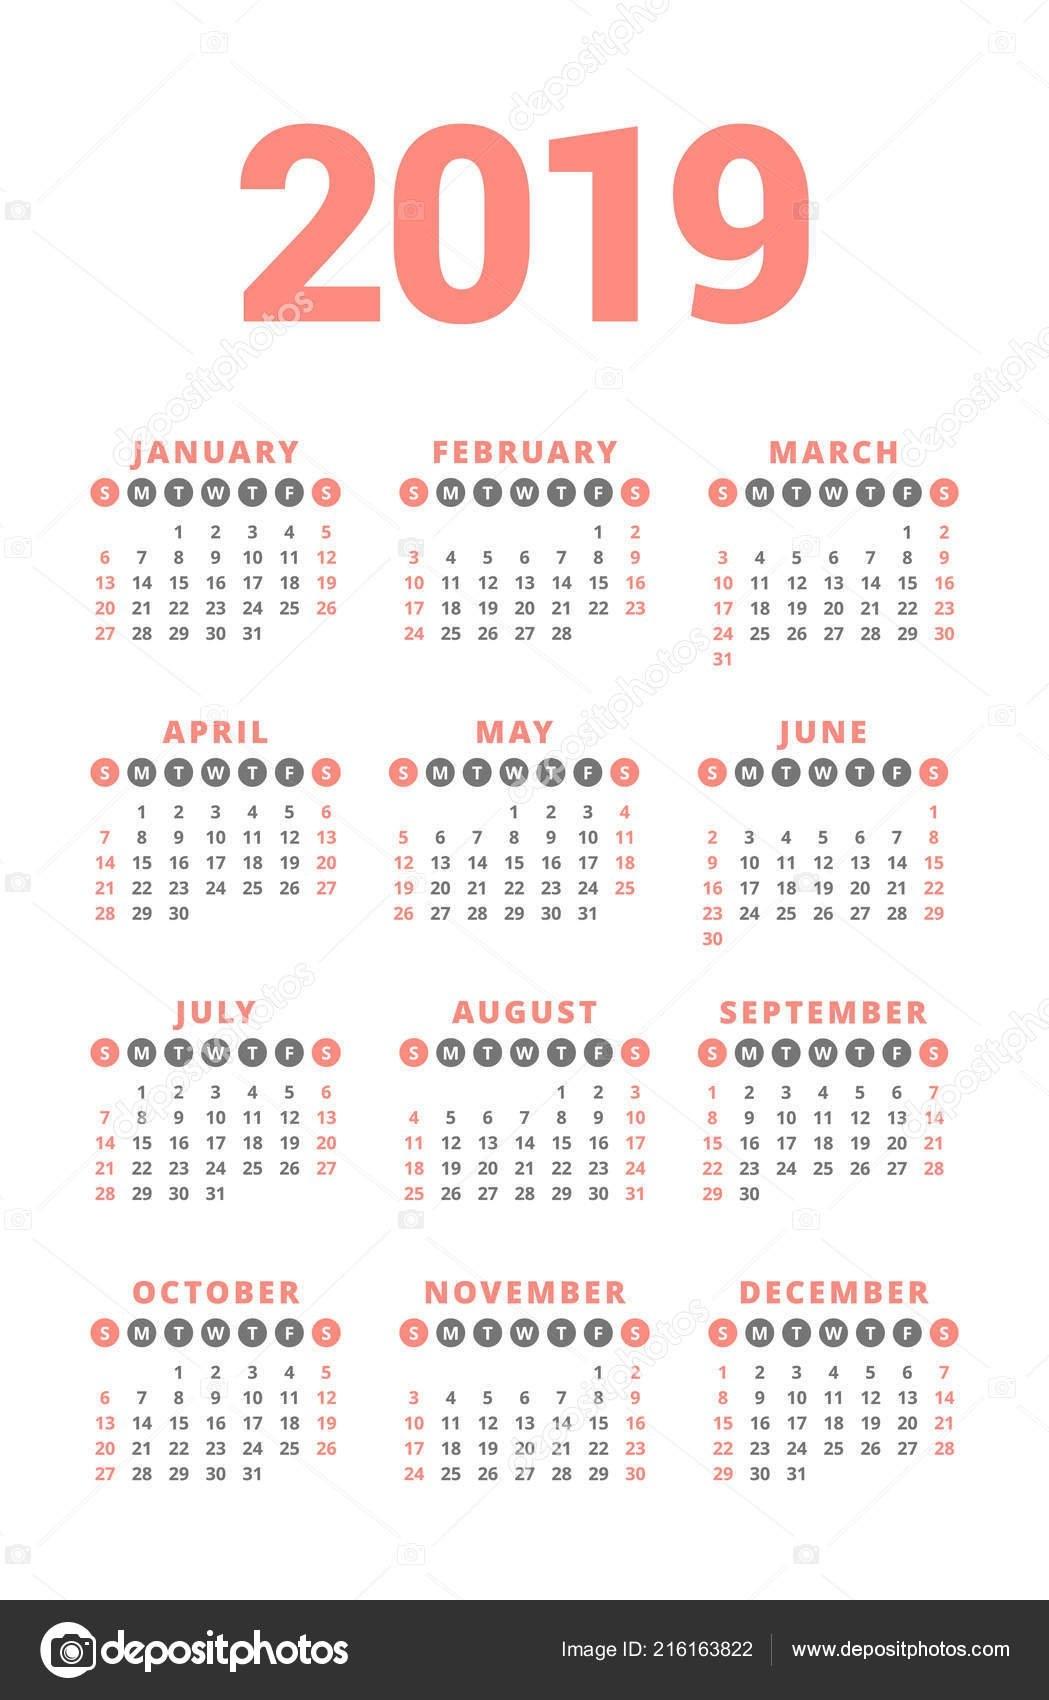 Calendar 2019 Year White Background Week Starts Sunday Columns Rows 3 Column Calendar 2019